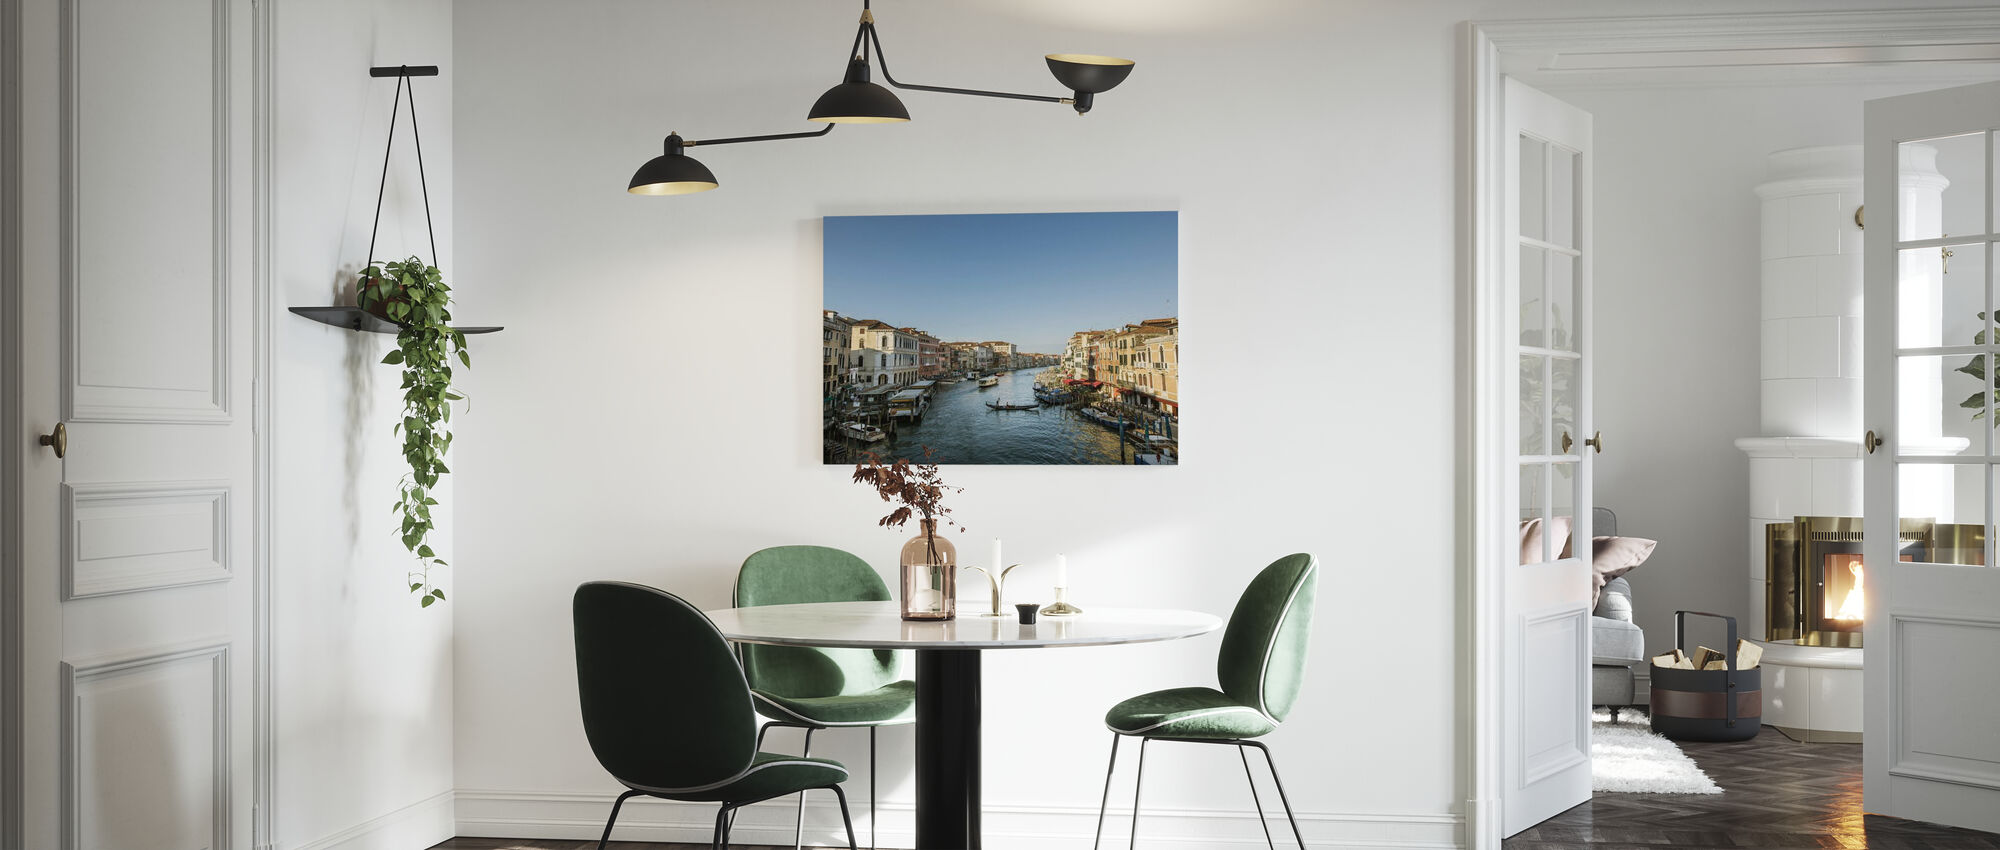 Blue Sky over Venice - Canvas print - Kitchen